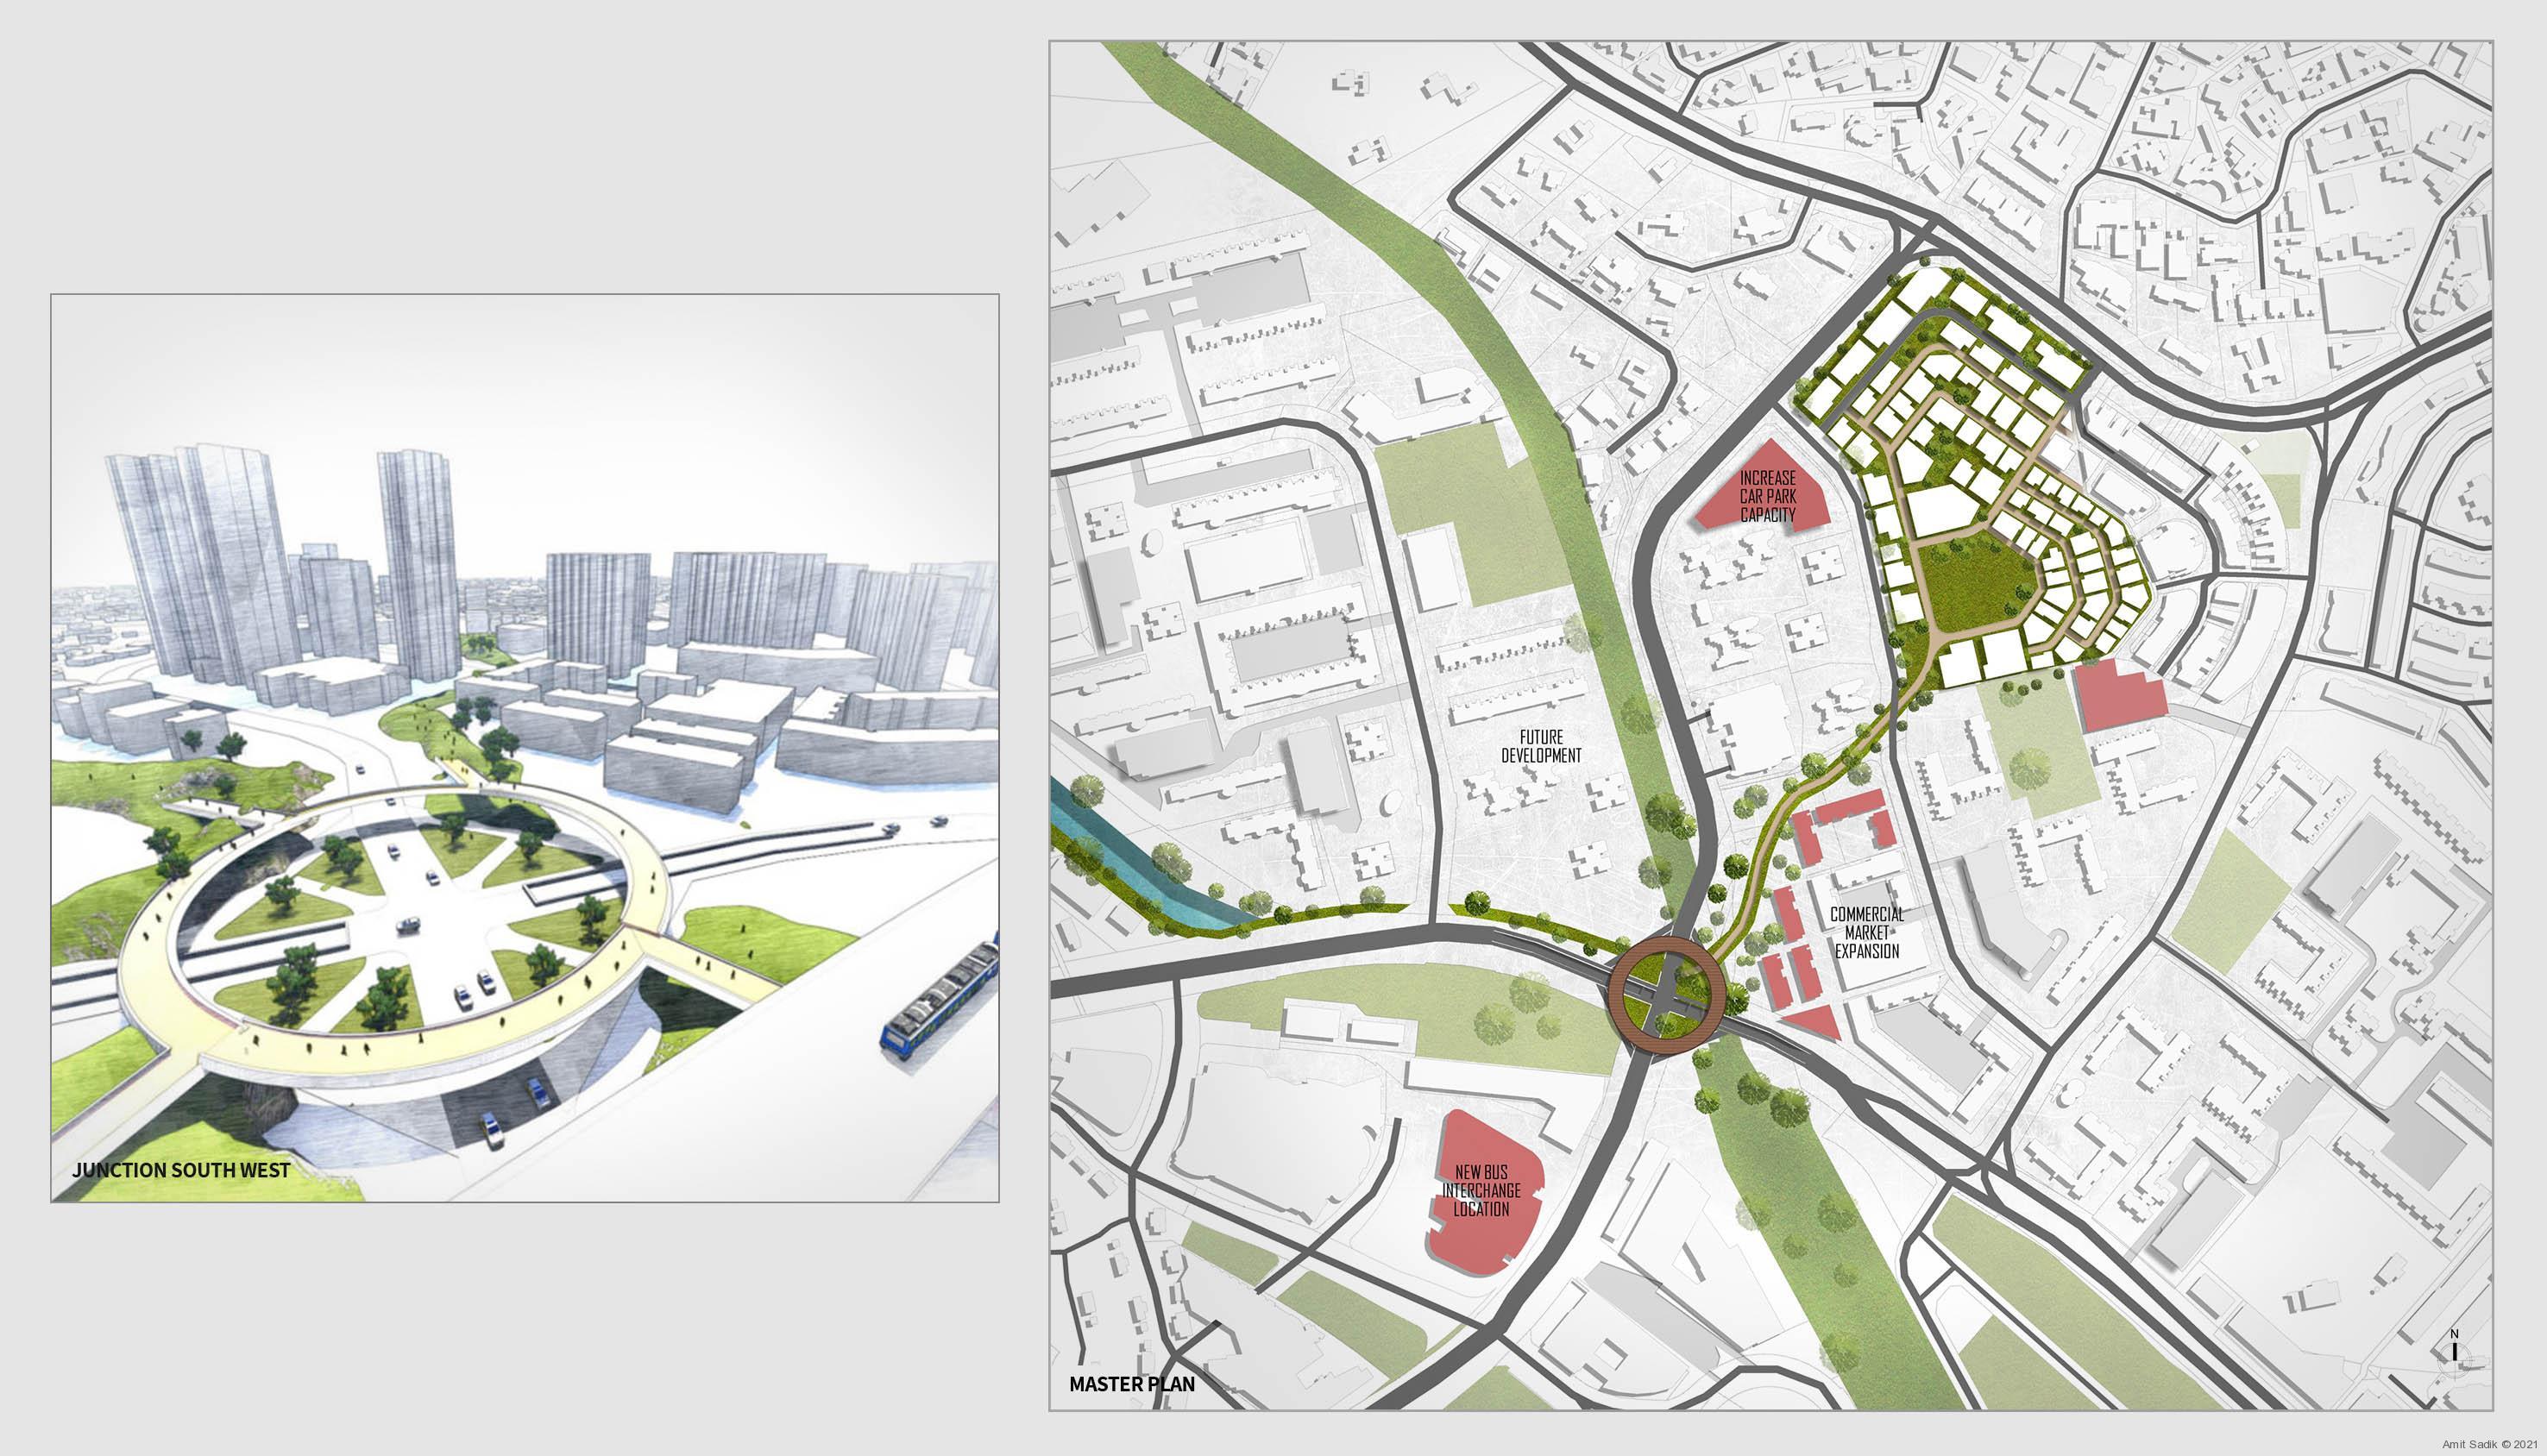 Urban plan, circular pedestrian bridge